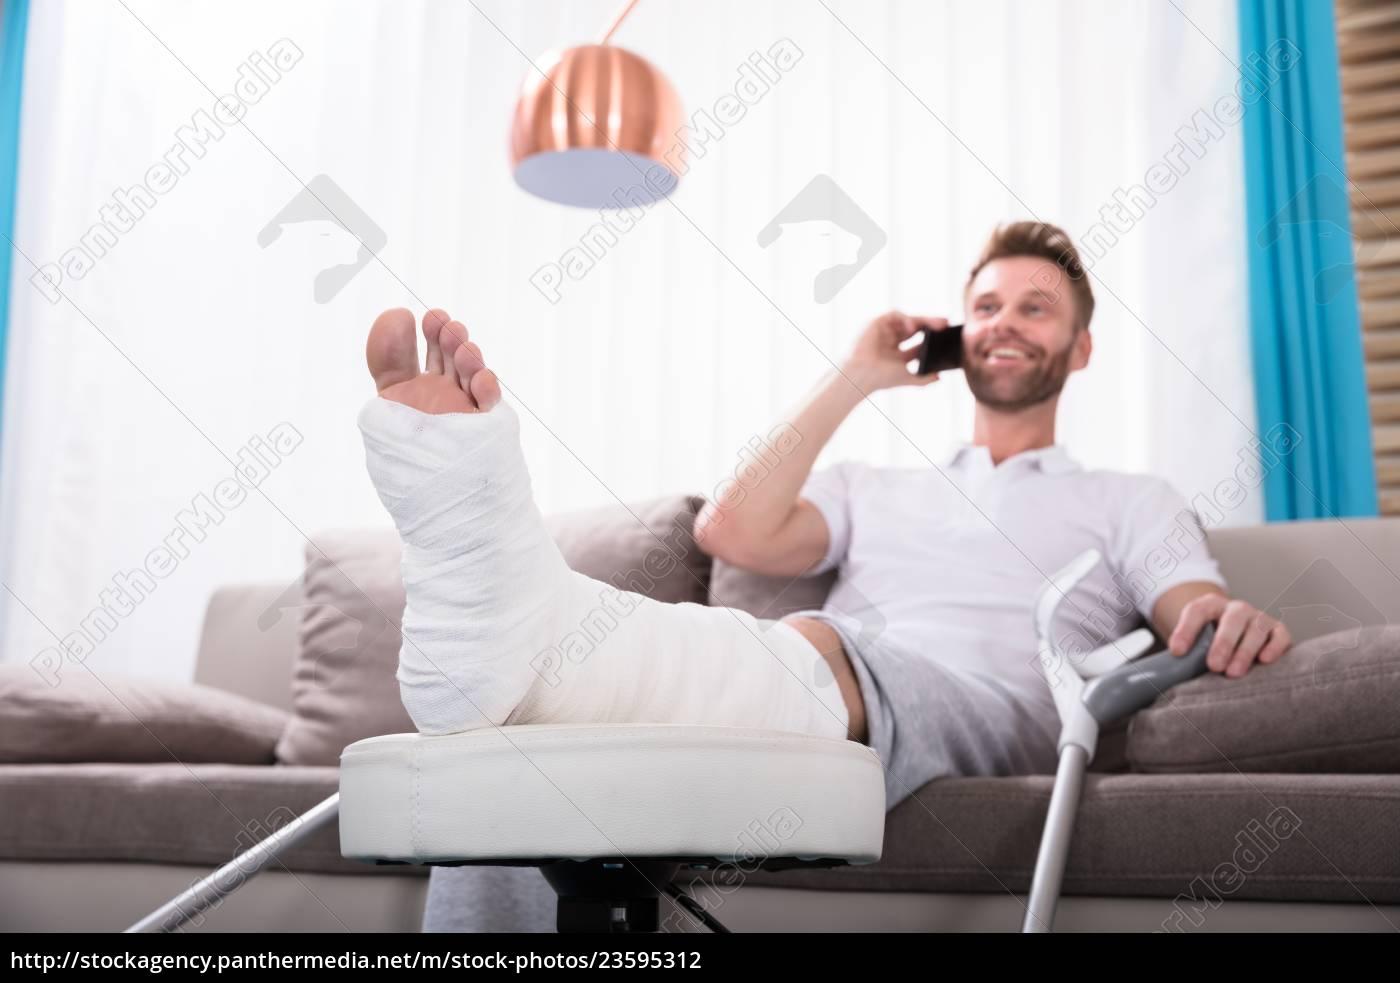 happy, young, man, with, broken, leg - 23595312